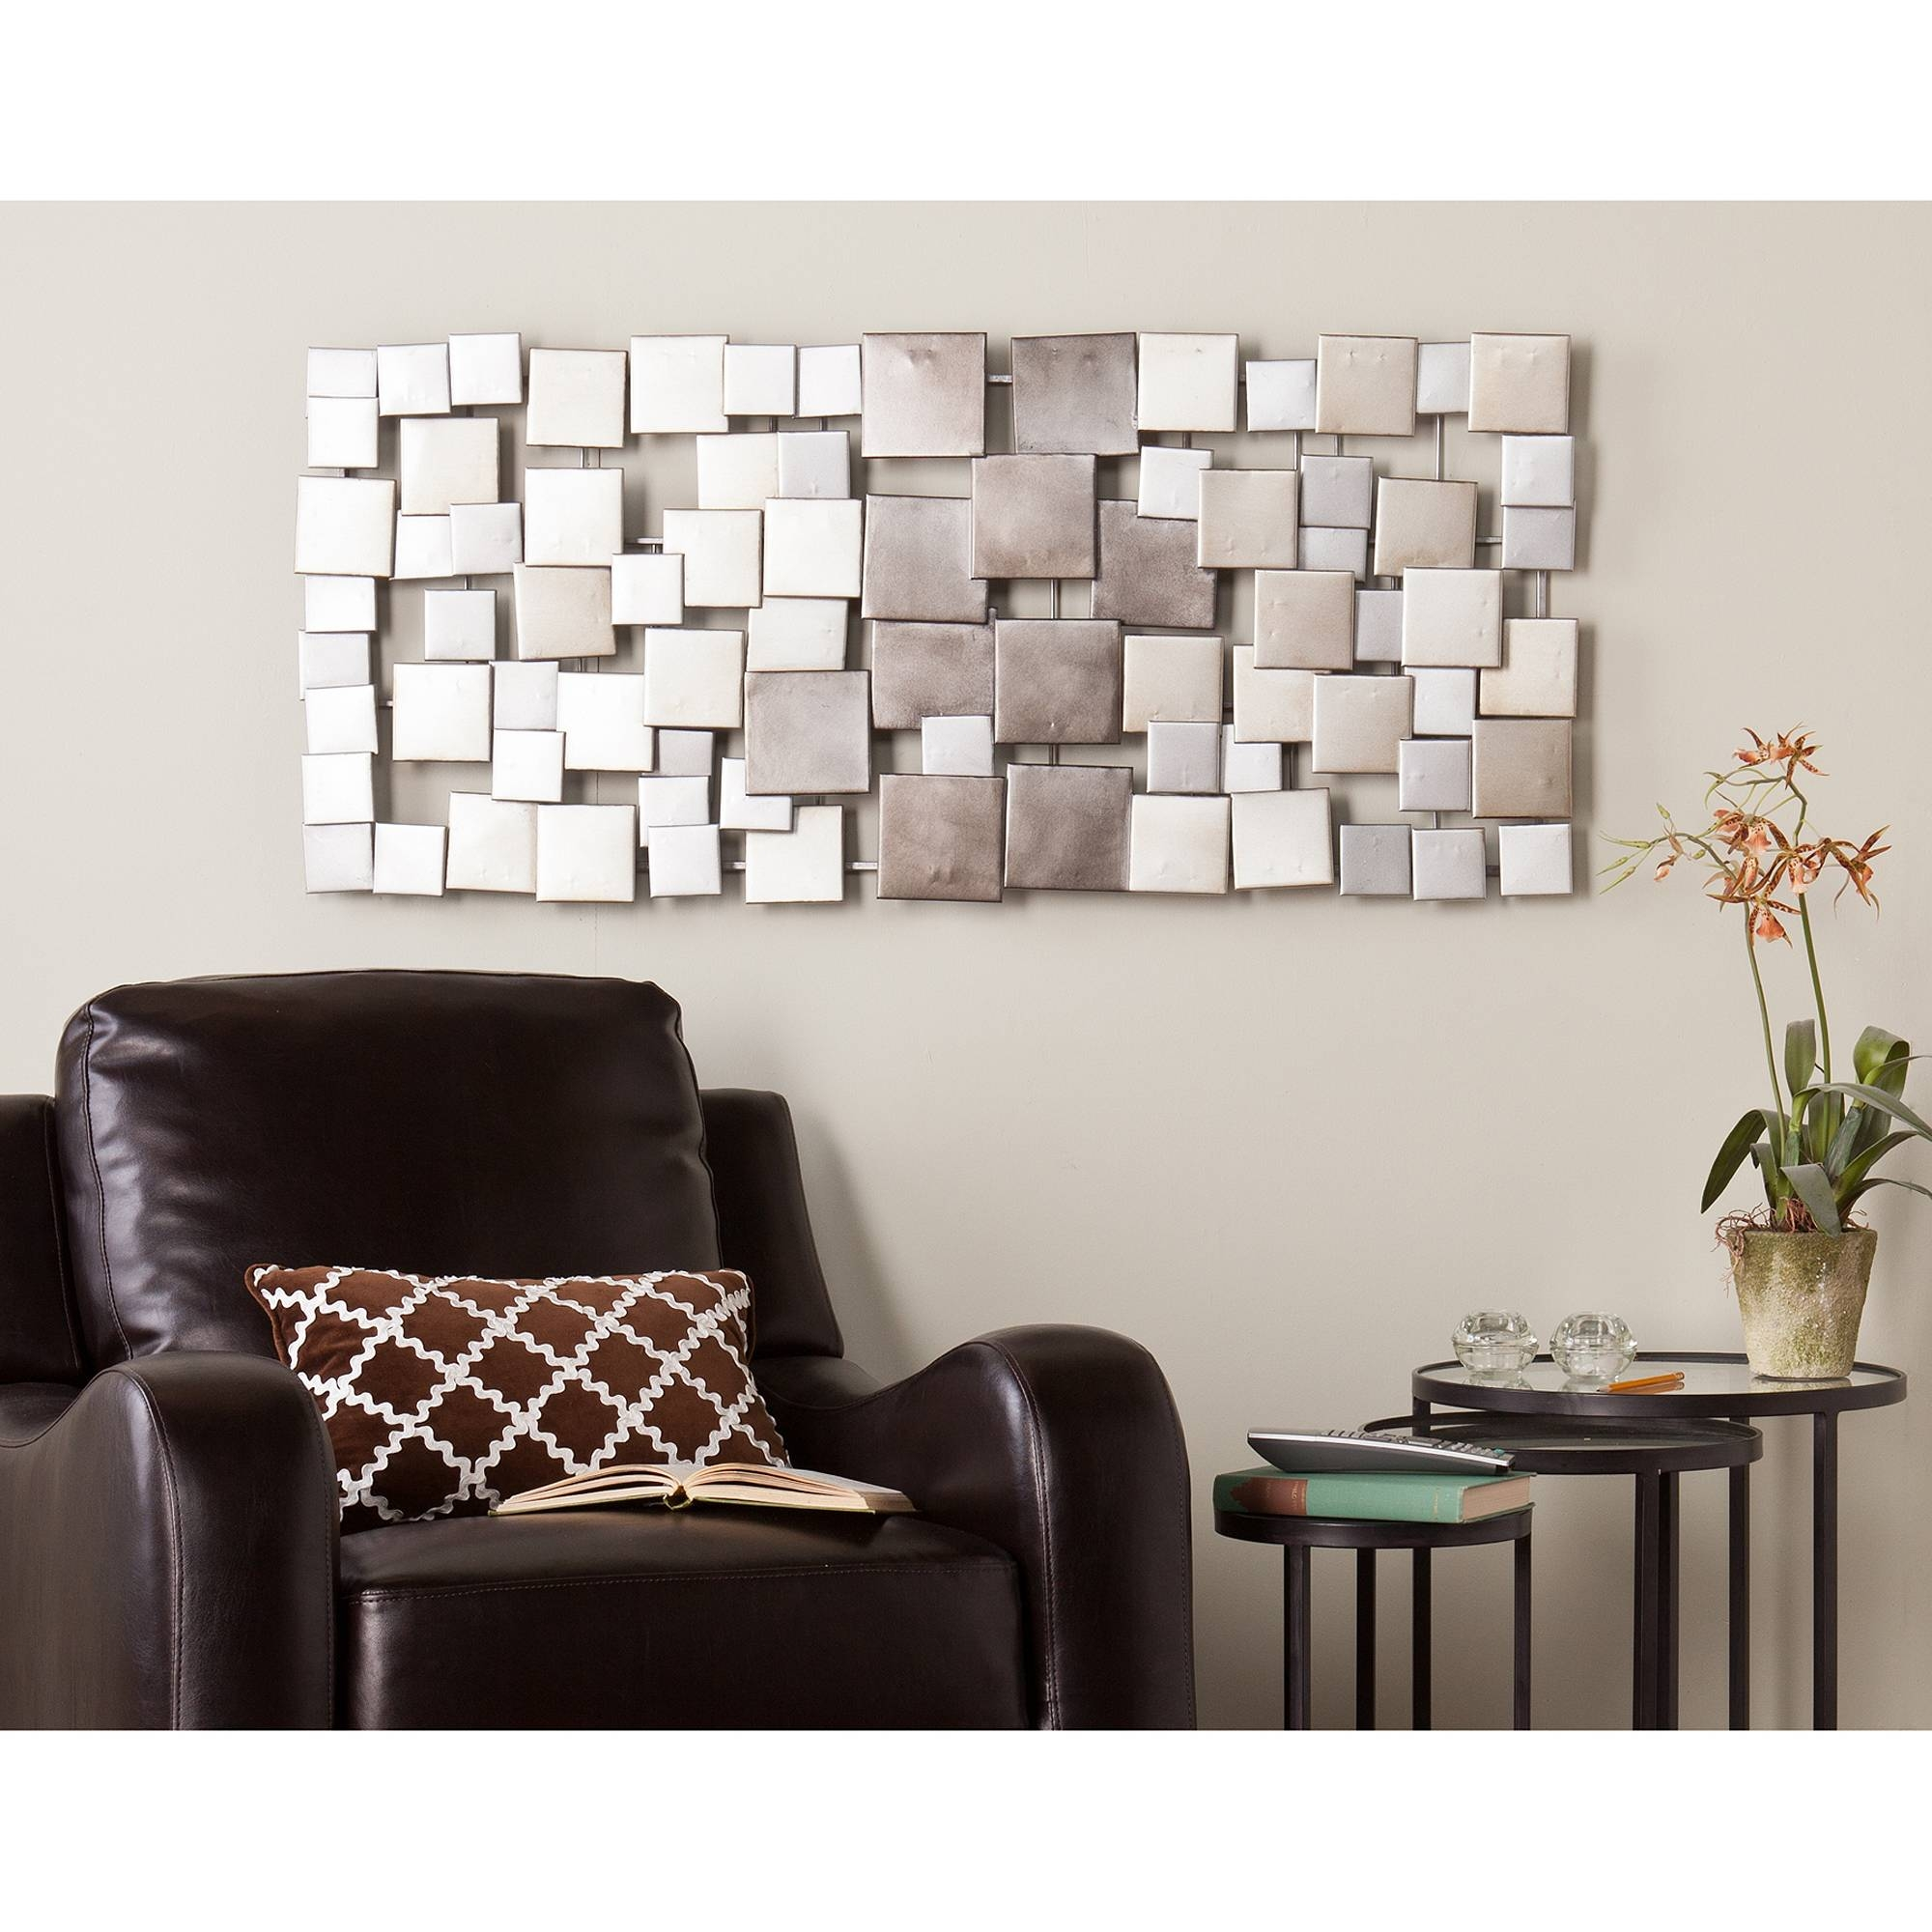 Metal Wall Art – Walmart Within Newest Horizontal Metal Wall Art (View 8 of 20)